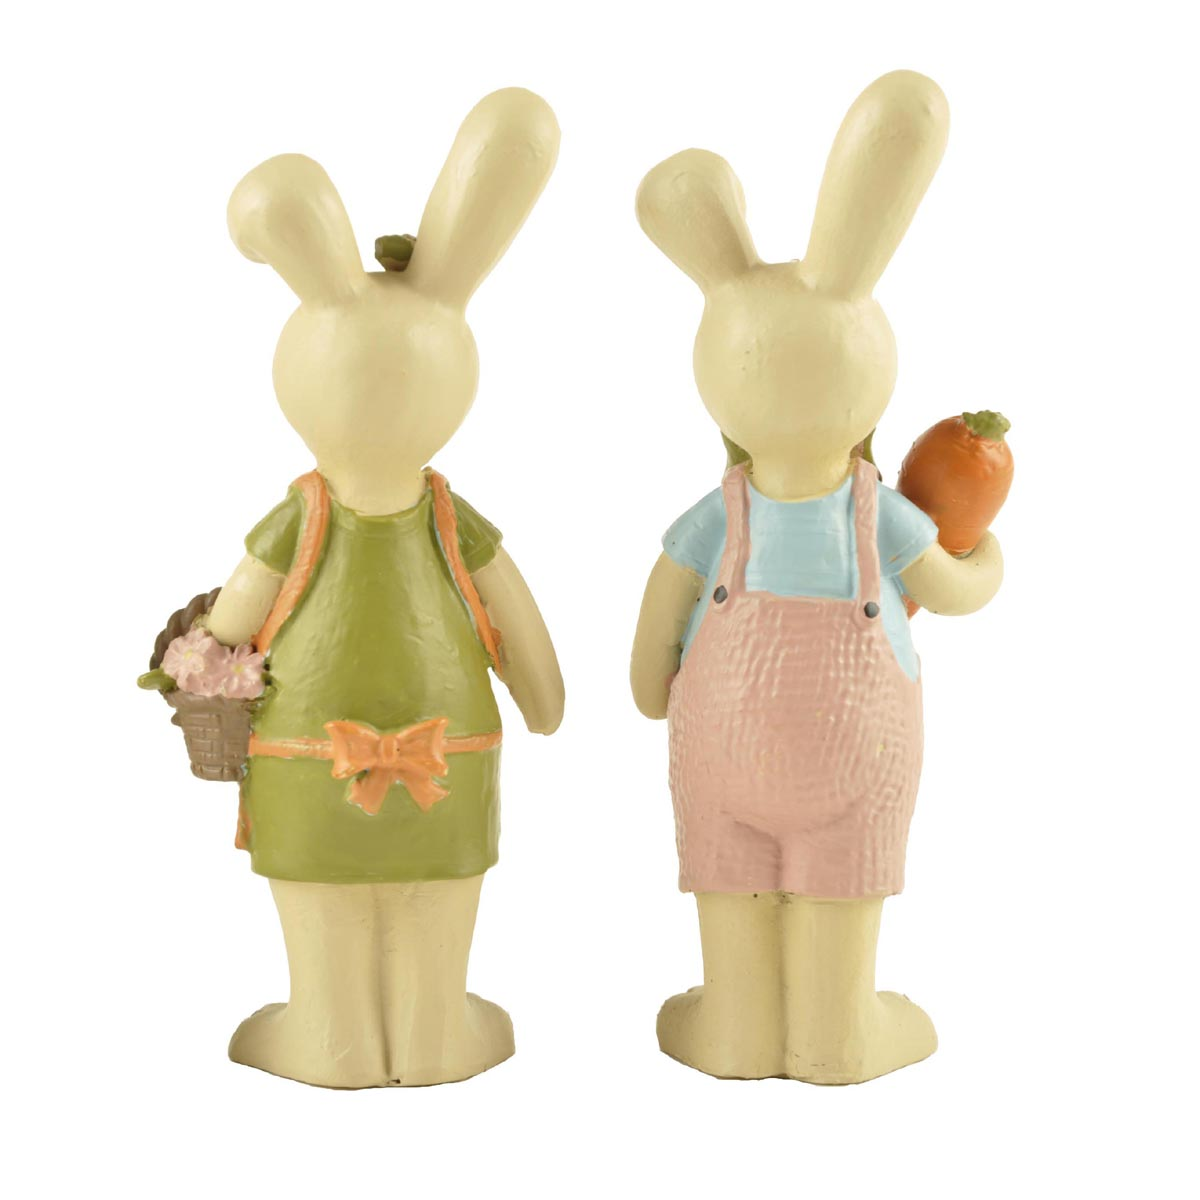 Ennas easter rabbit decor top brand for holiday gift-2